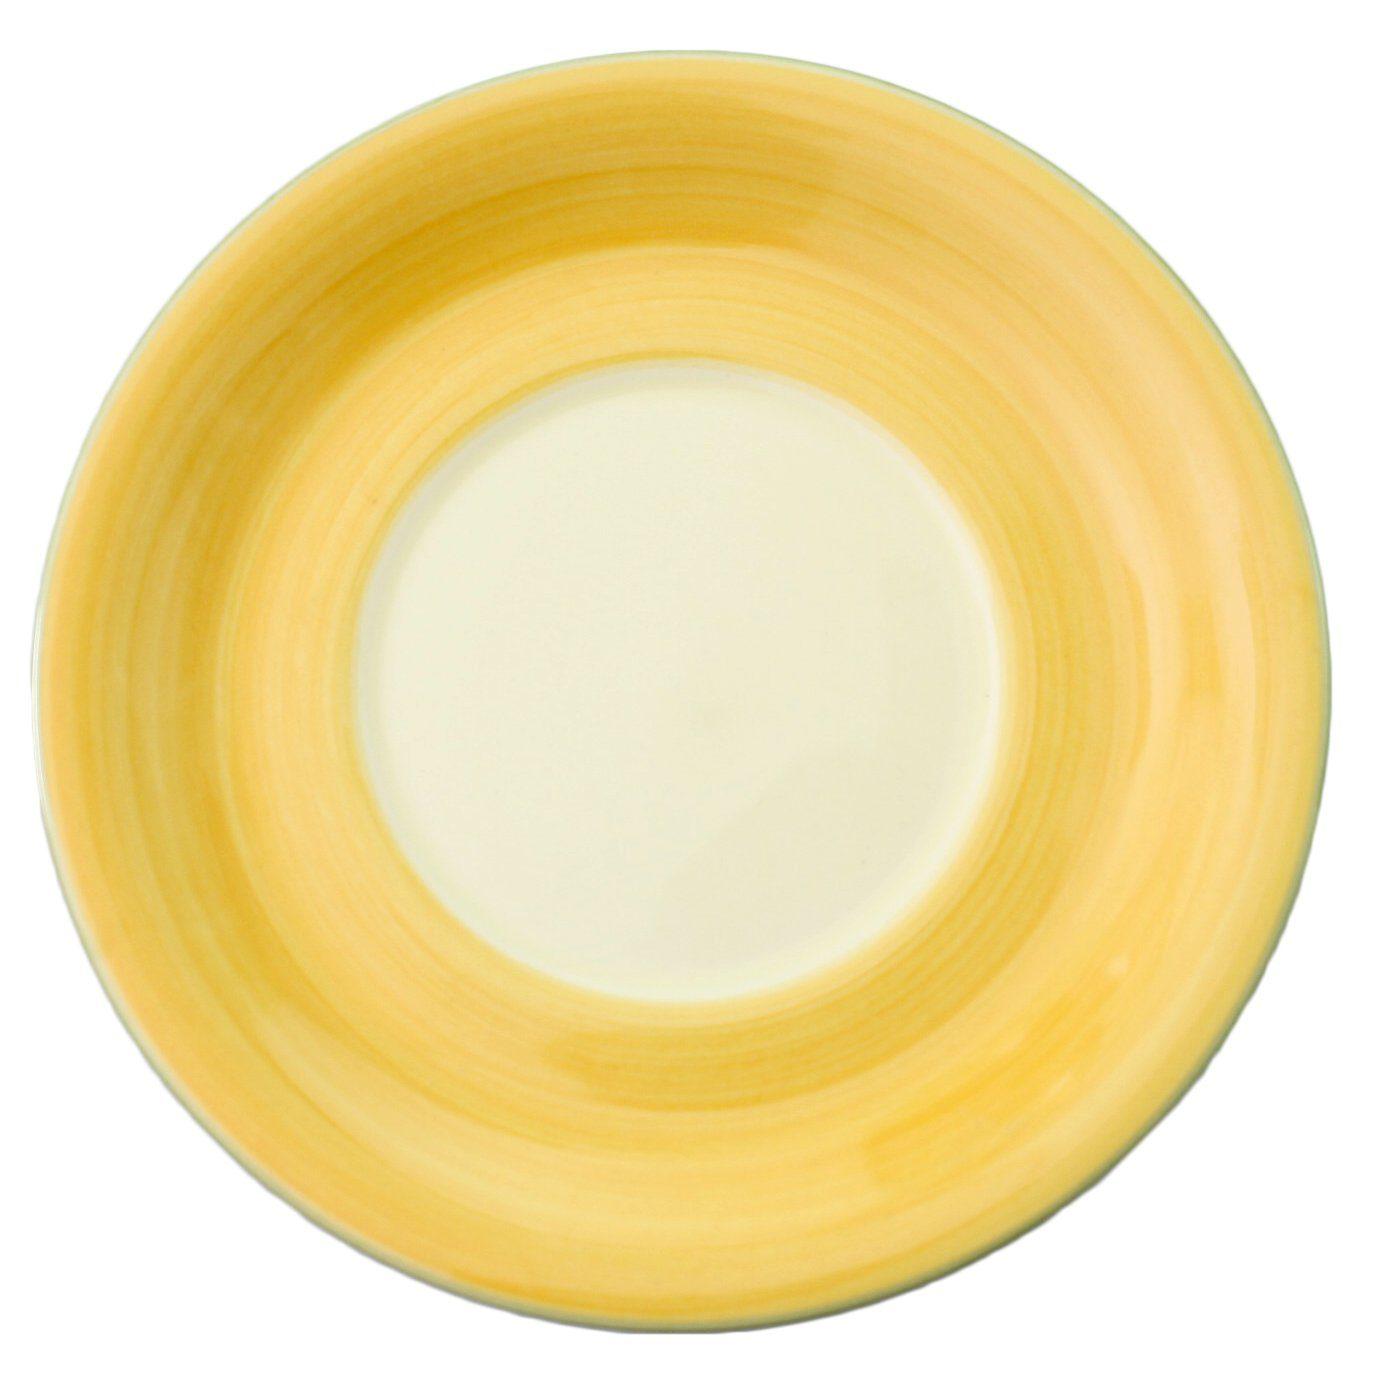 Zeller Keramik Suppenuntertasse »Biene«